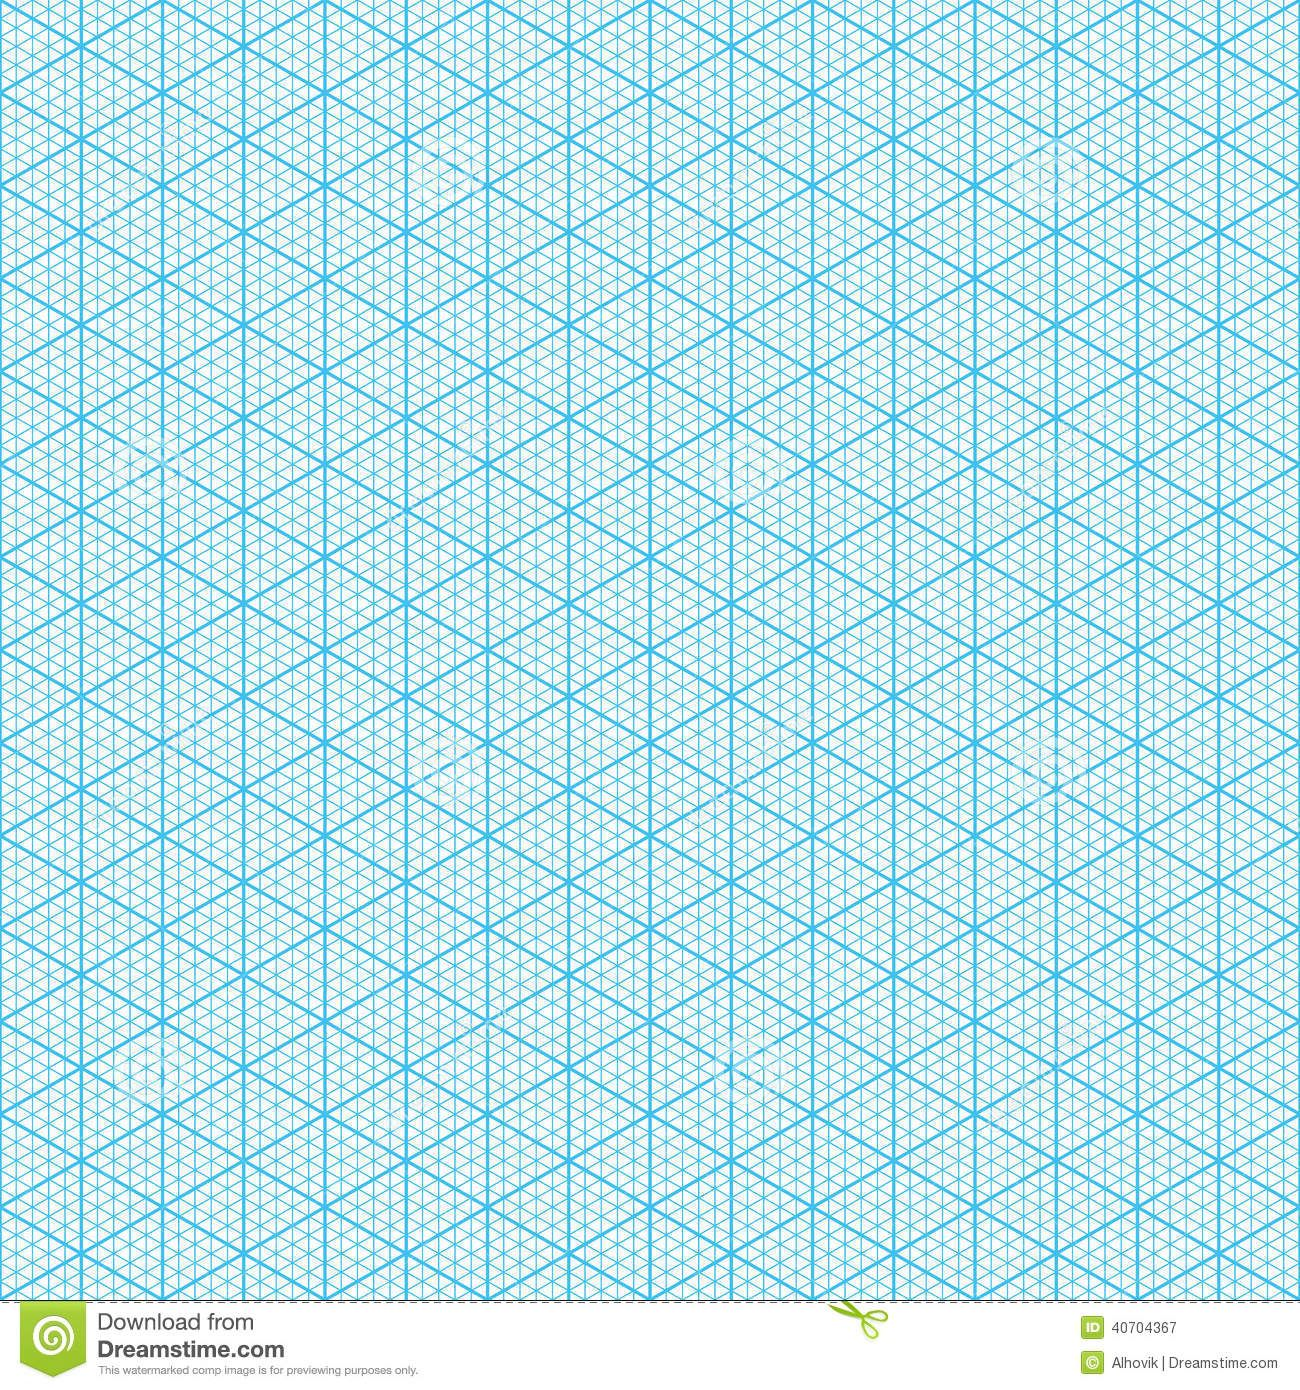 Isometric Graph Paper Seamless Illustration 40704367 1,300×1,390